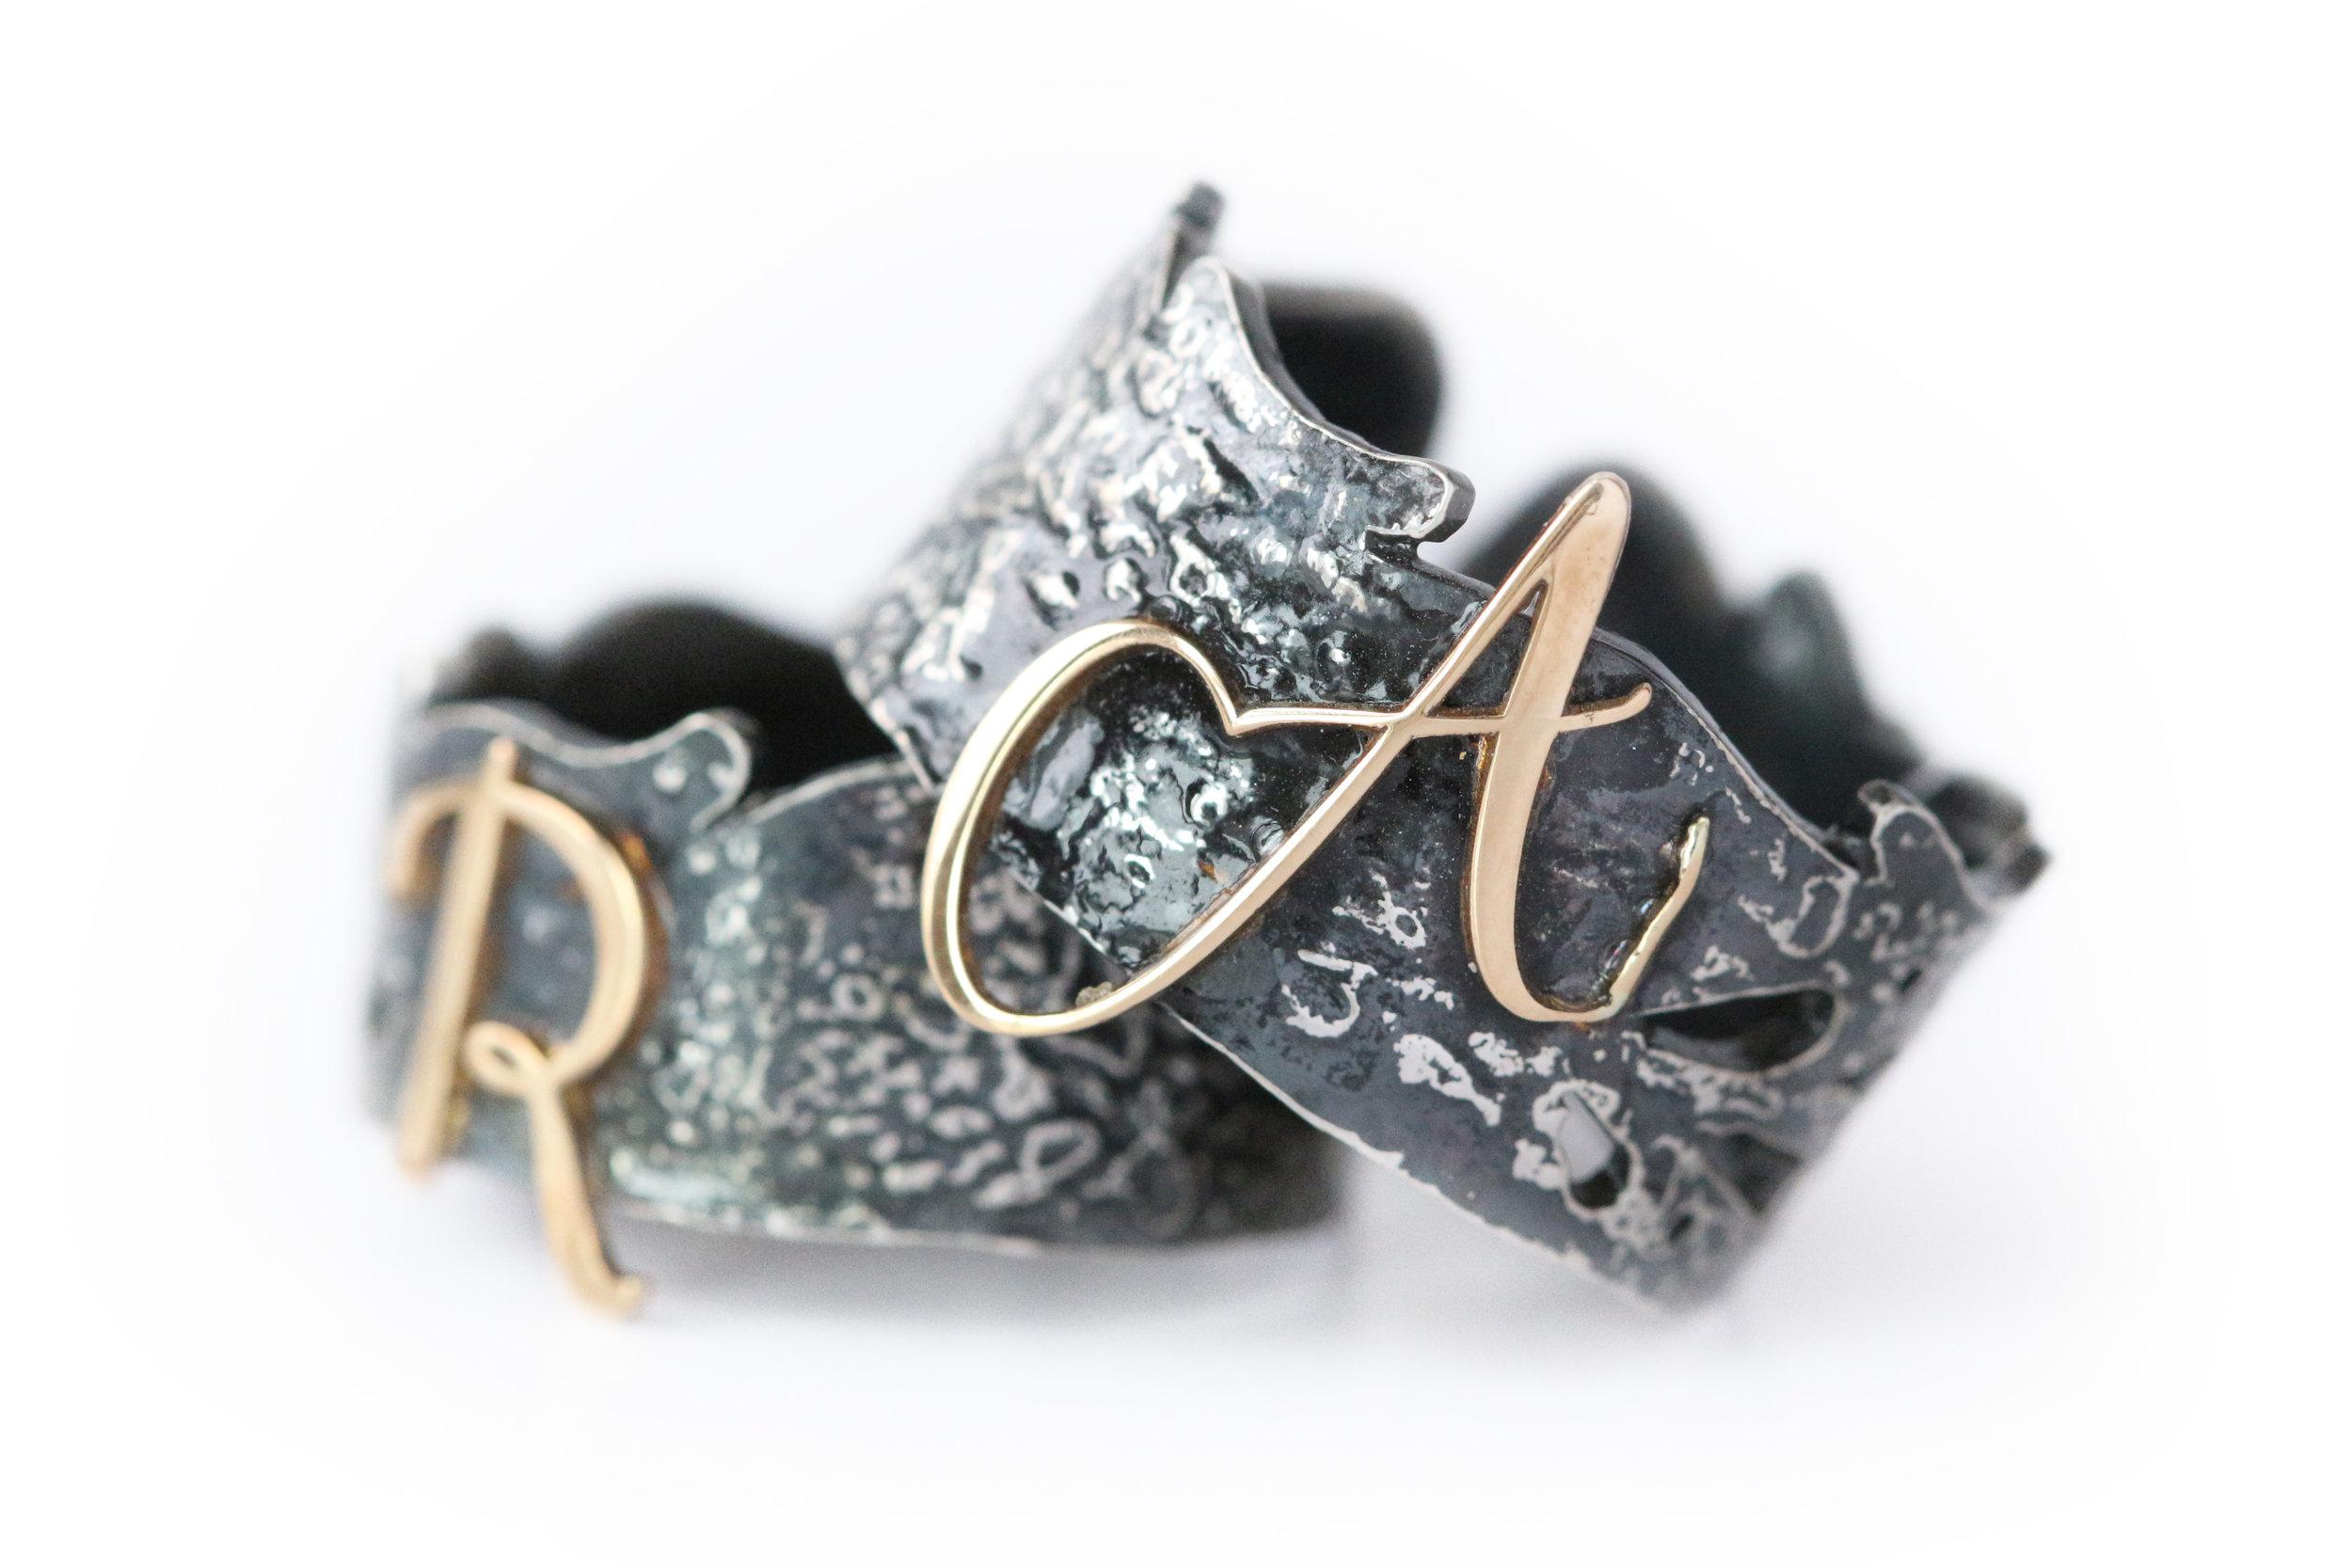 Vesta Monogram Ring - Antiqued  Click here to shop